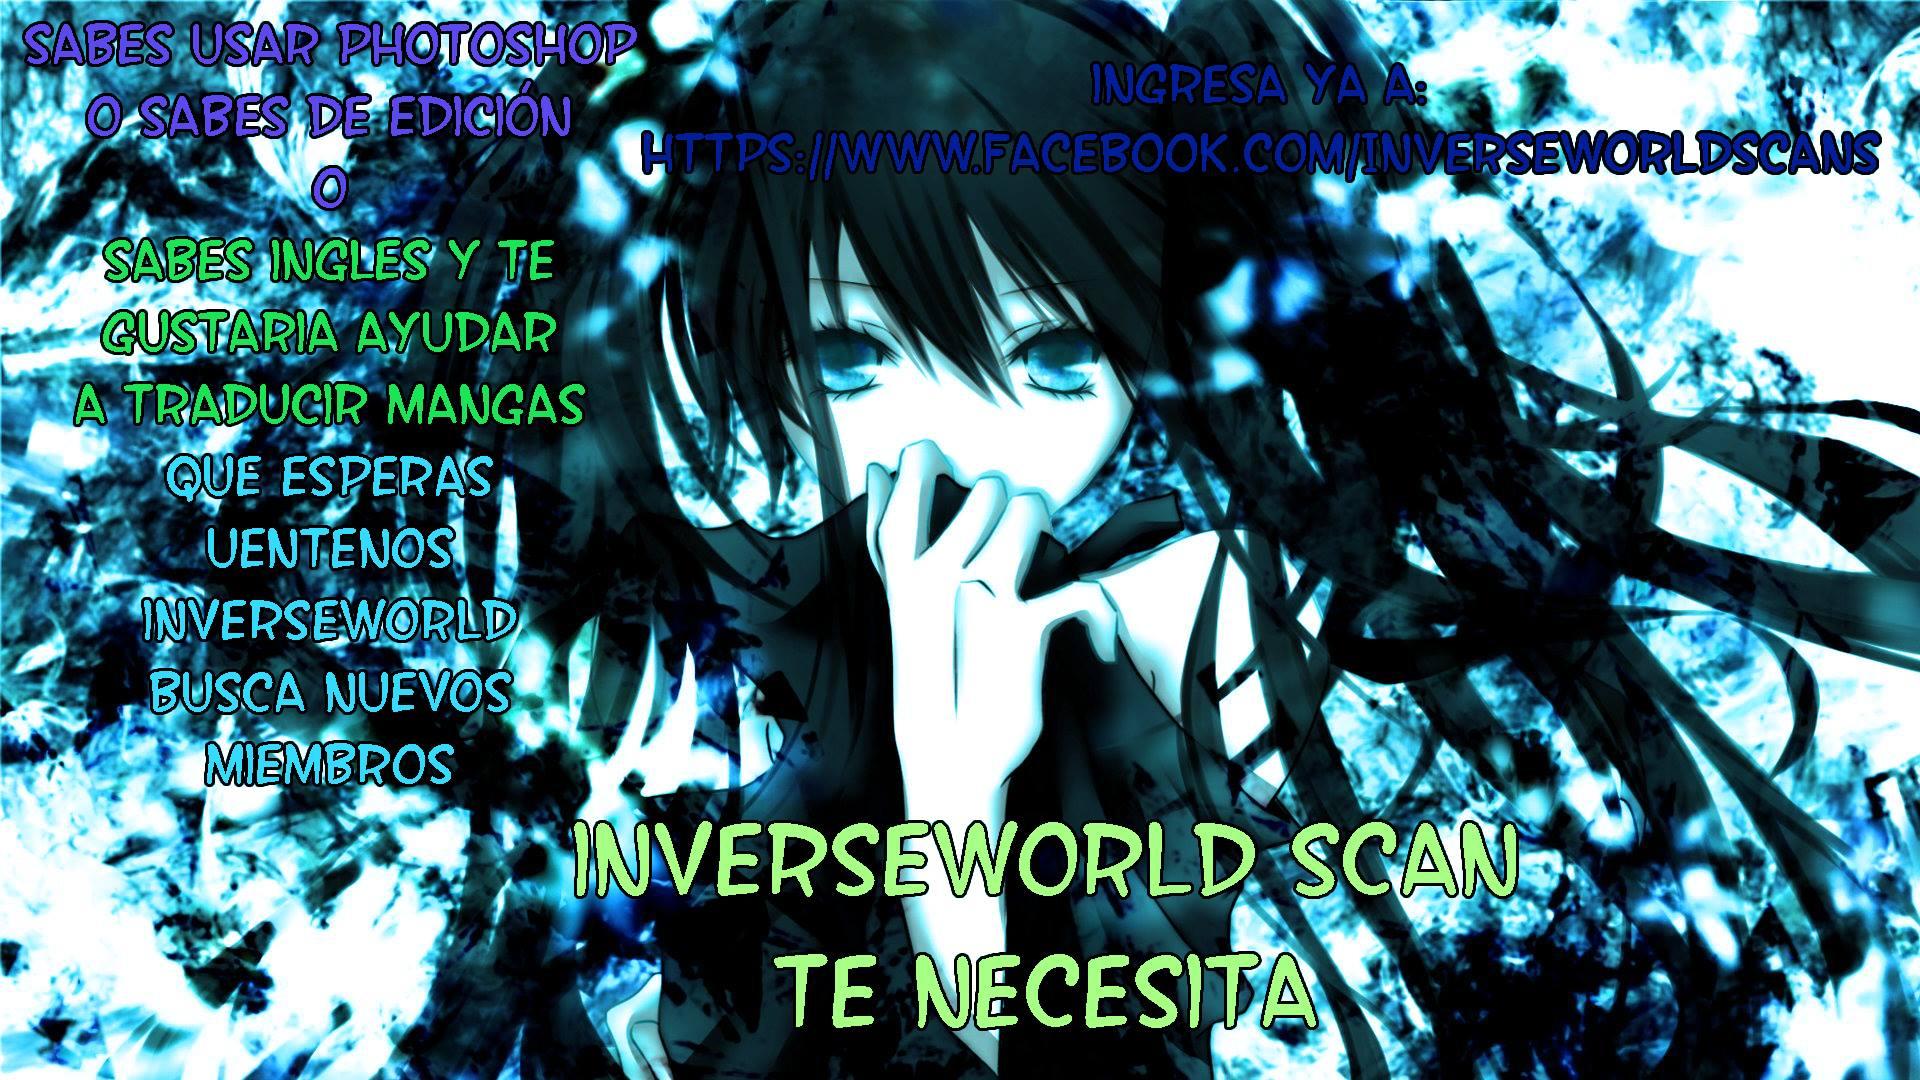 https://c5.mangatag.com/es_manga/18/16210/415305/e60624d4c57e4c744eeabd54648d21c2.jpg Page 1